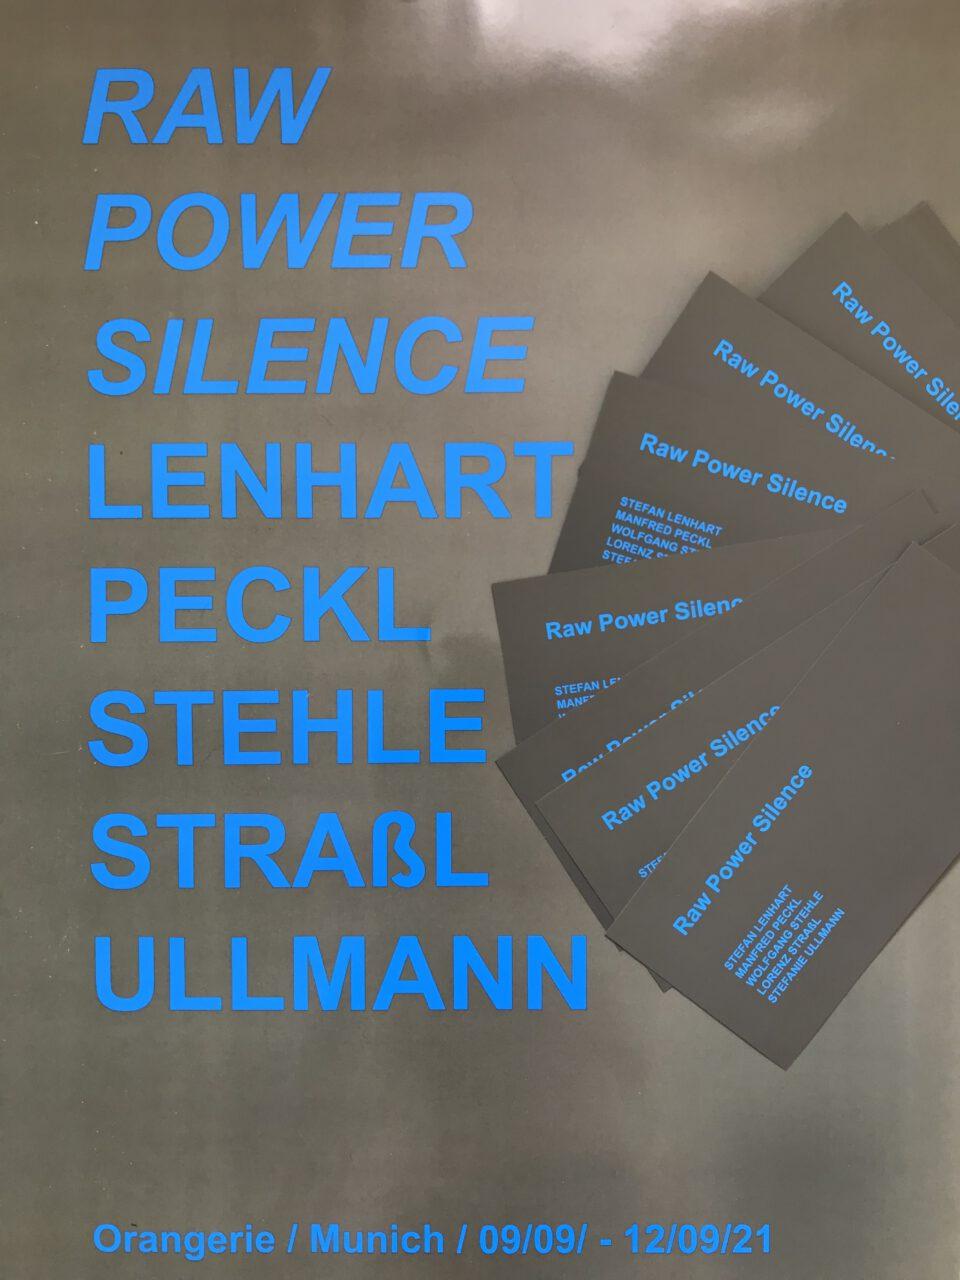 RAW POWER SILENCE